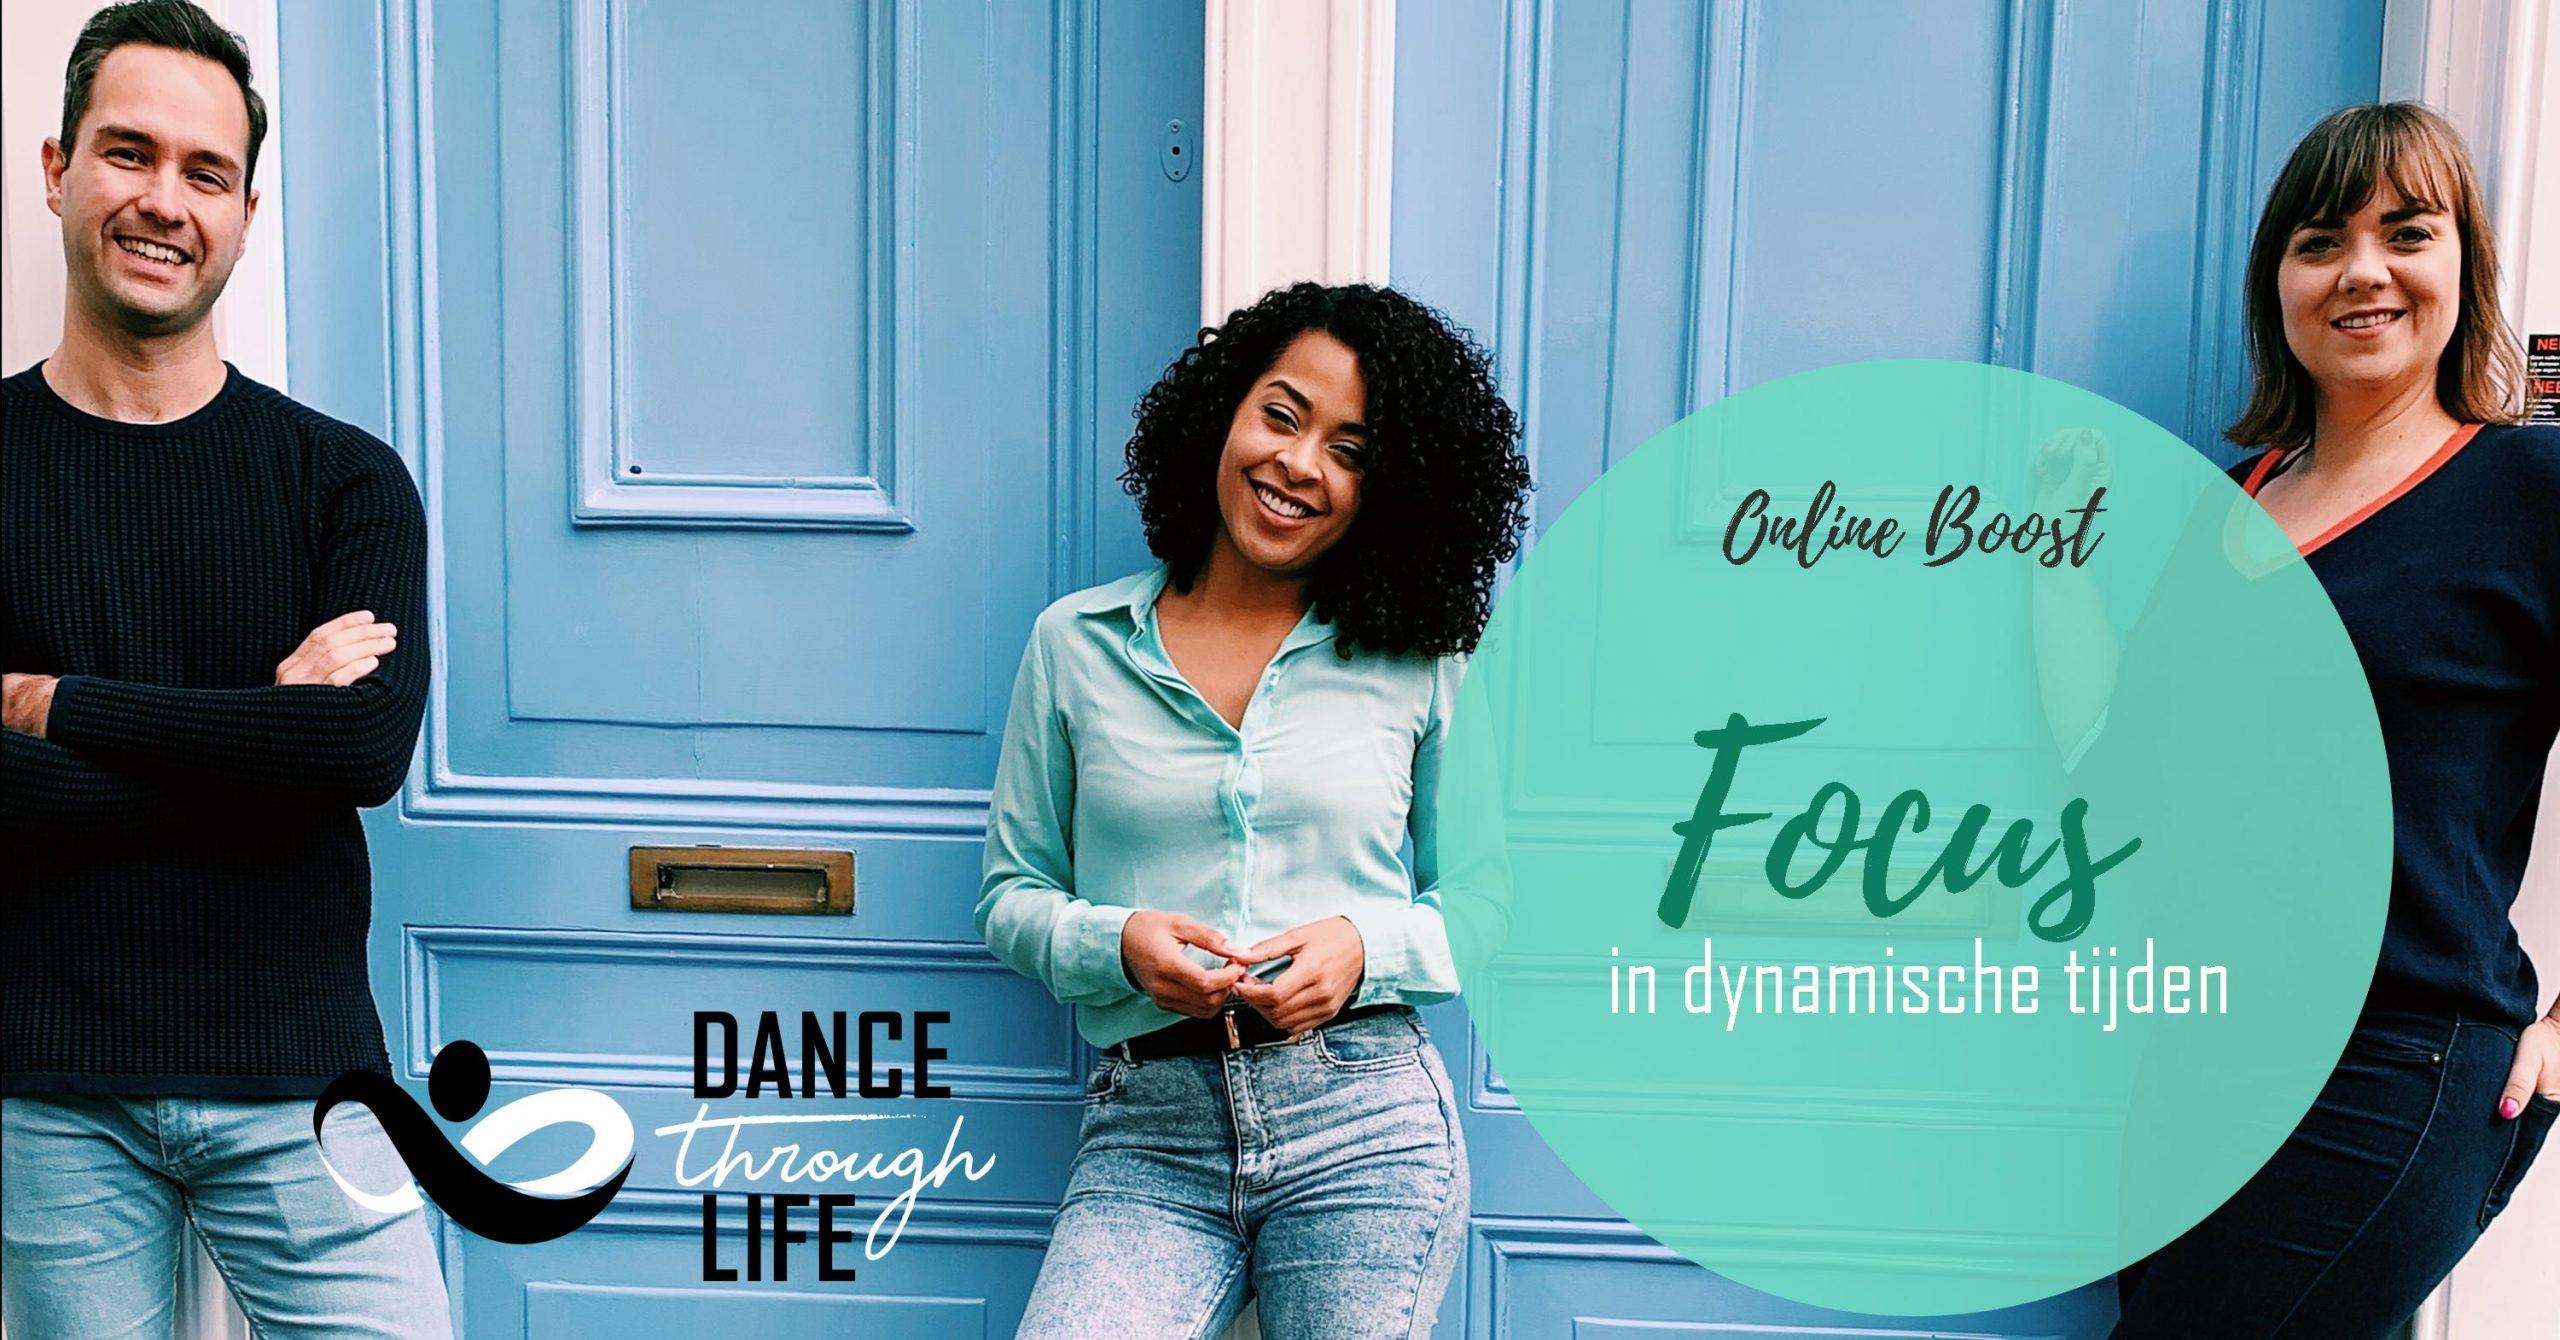 Online Boost - Dance Through Life